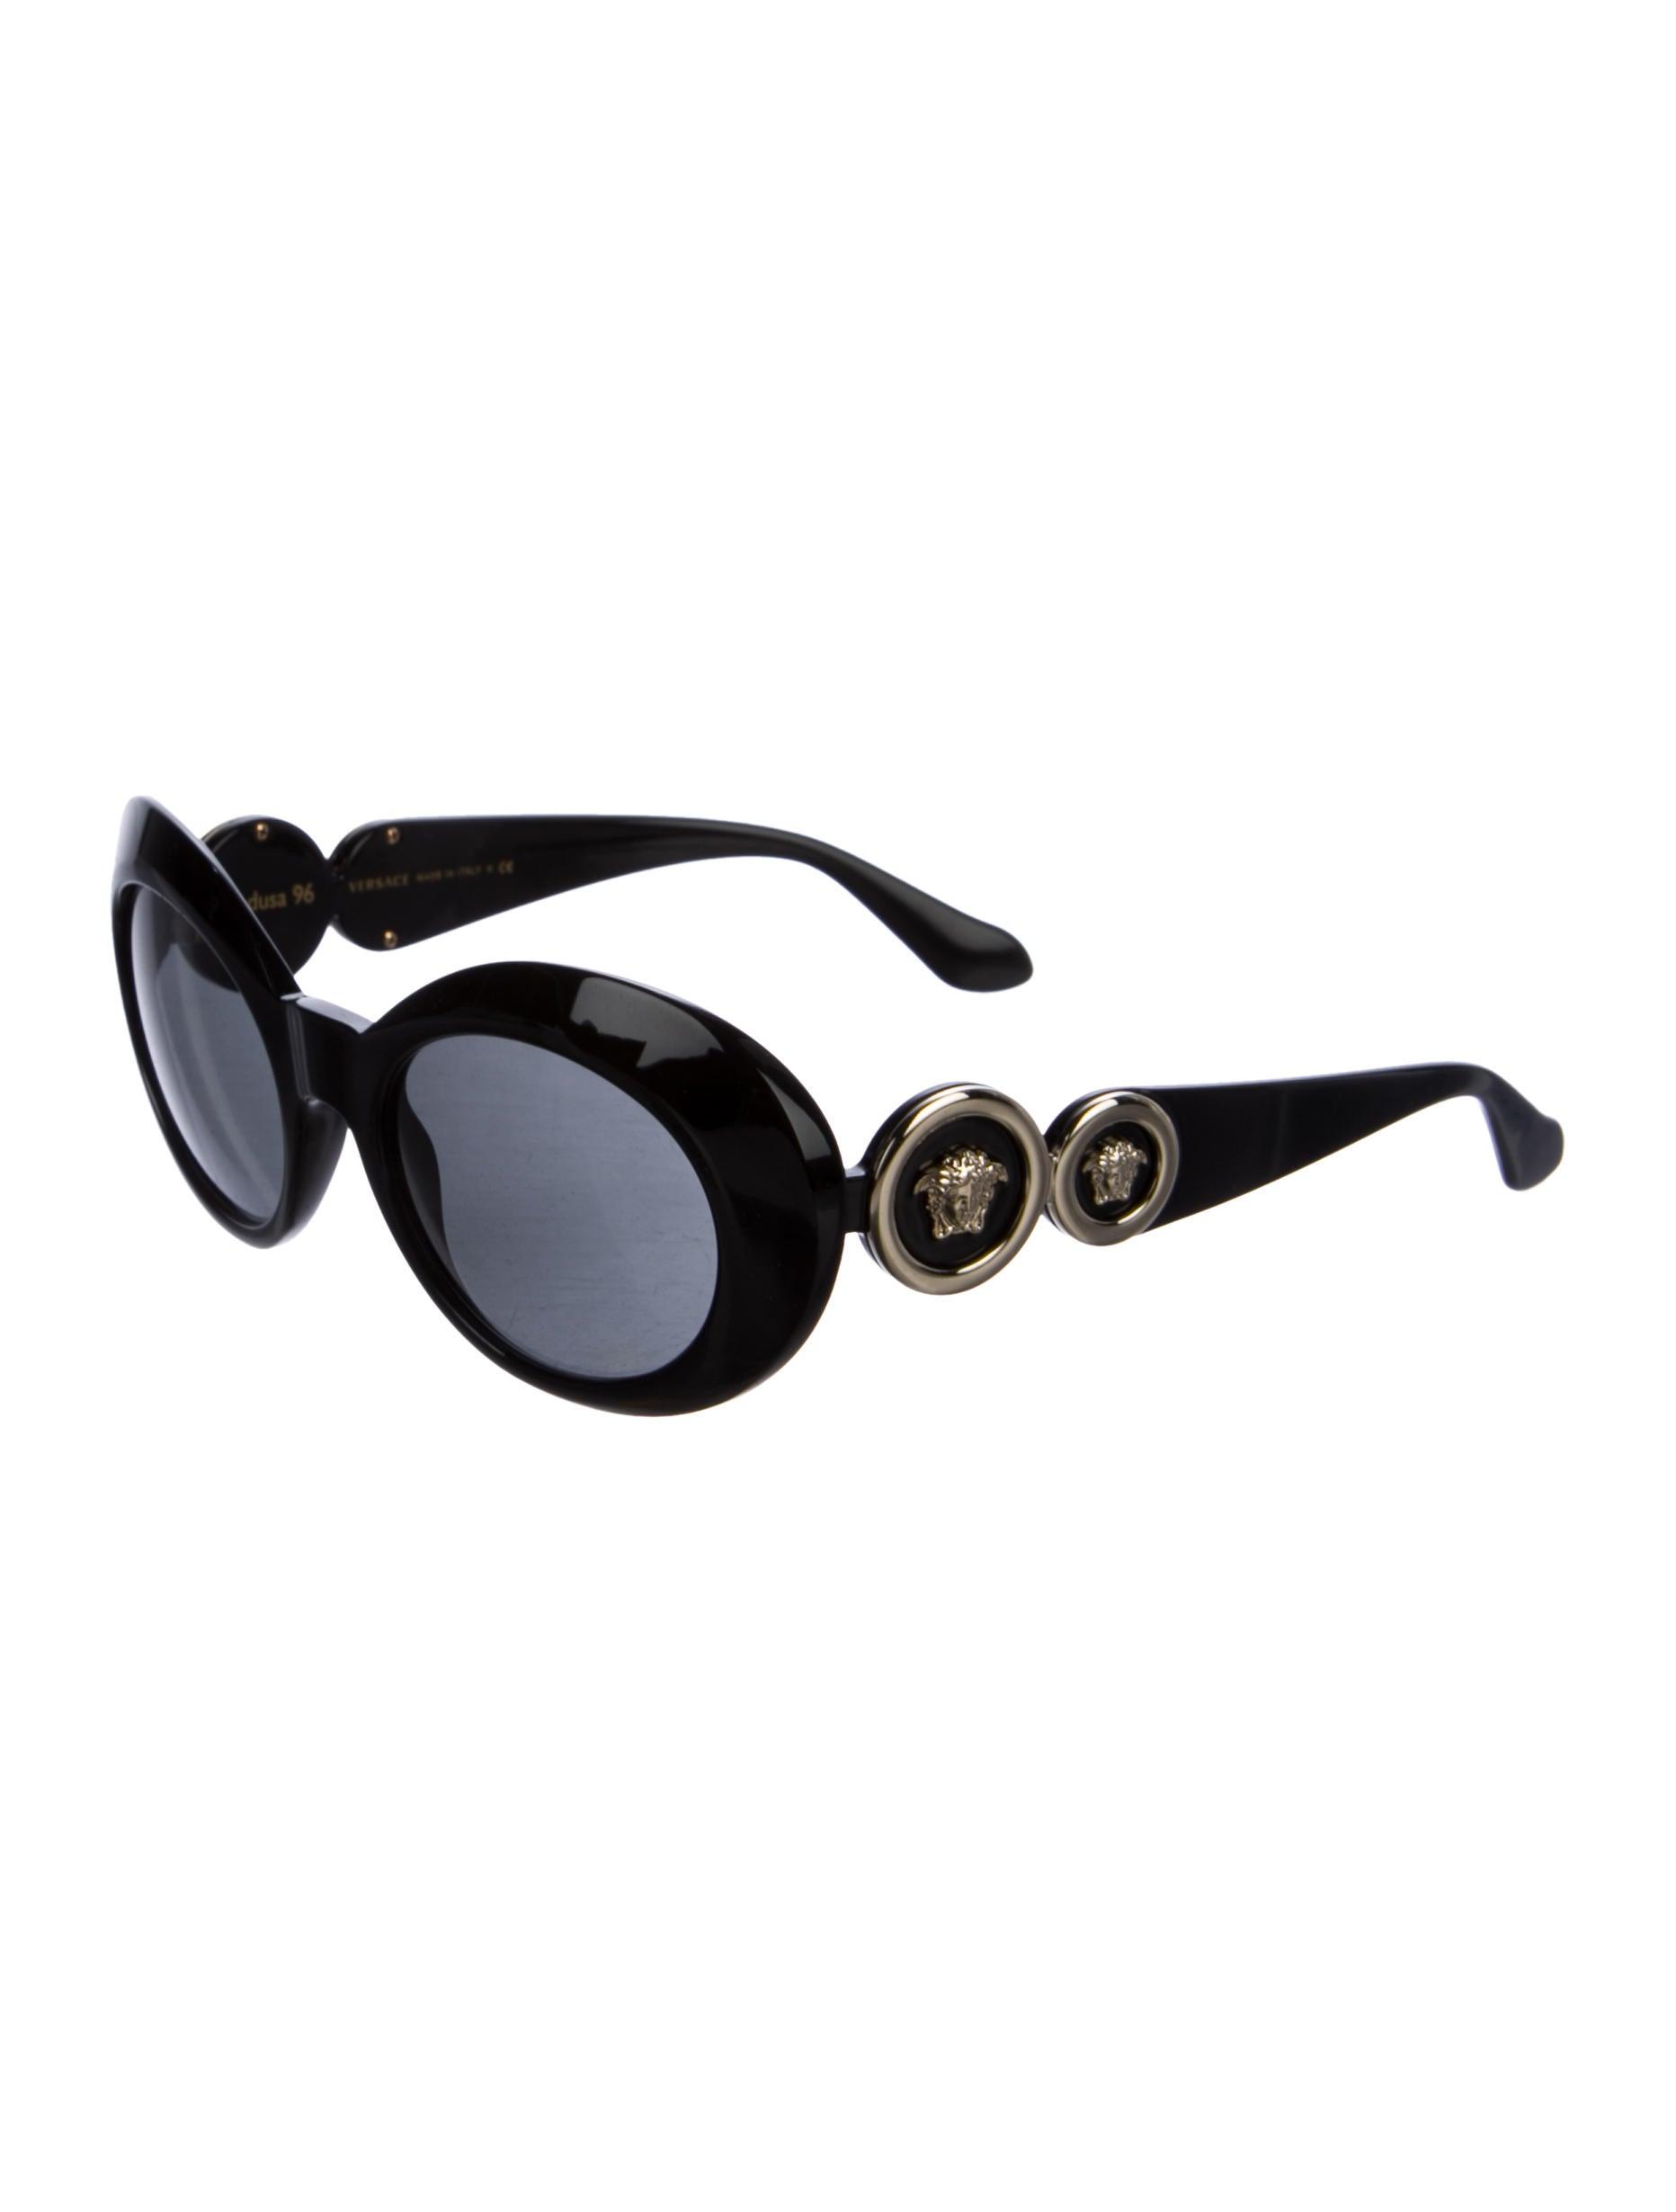 eb863f60fb3a Versace Round Sunglasses - Bitterroot Public Library